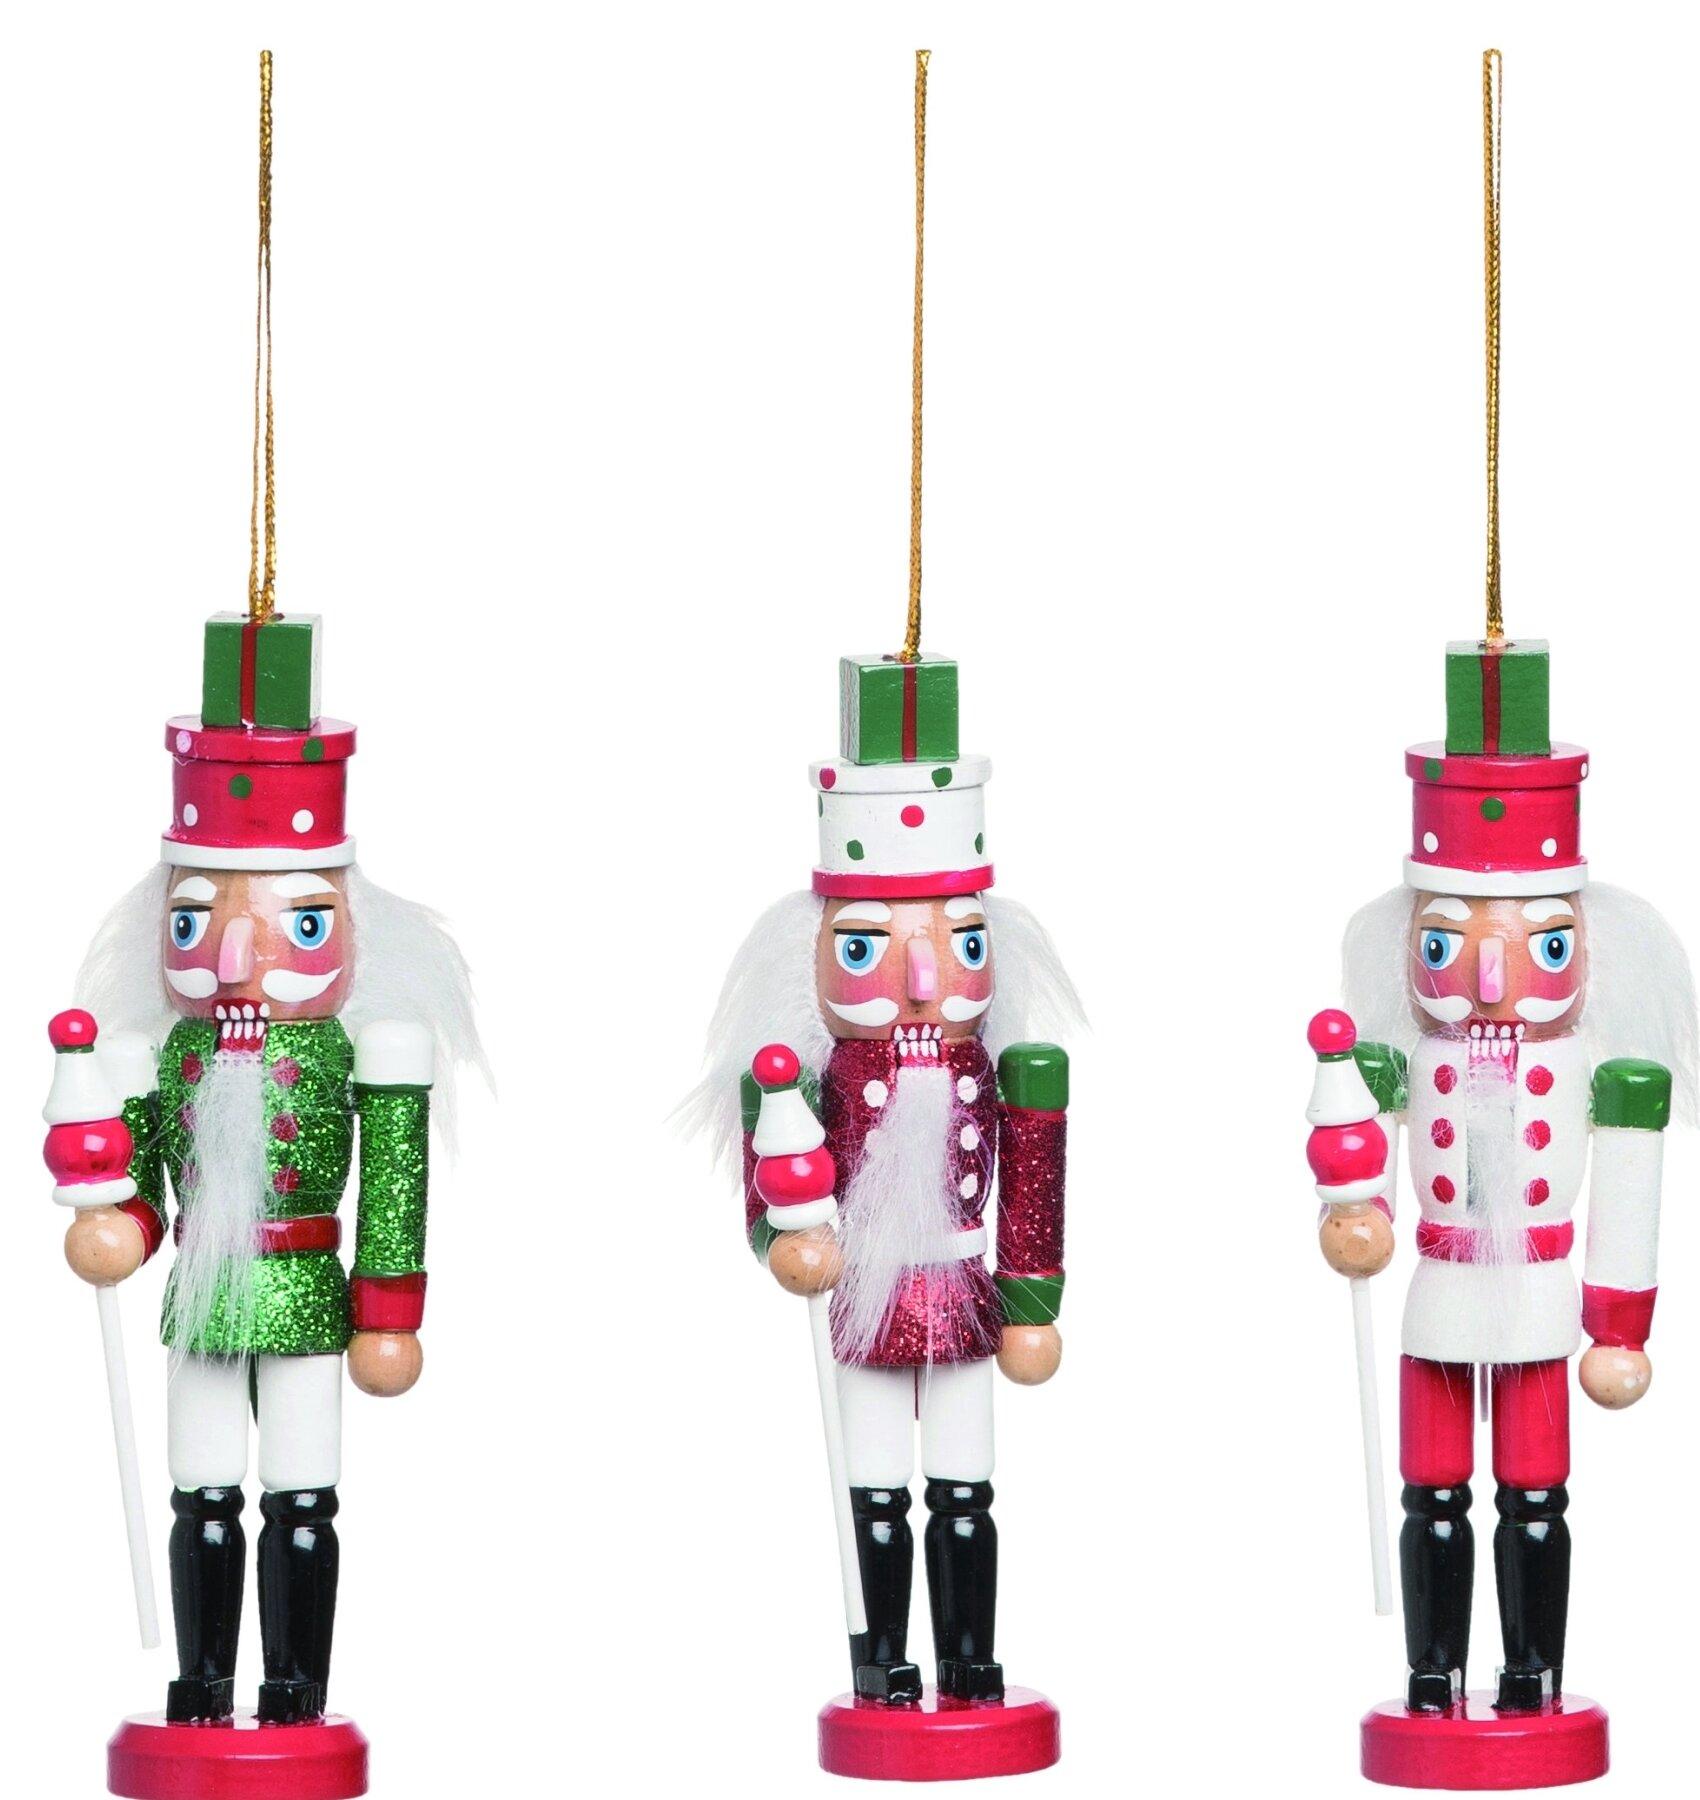 The Holiday Aisle 3 Piece Nutcracker Hanging Figurine Ornament Set Wayfair